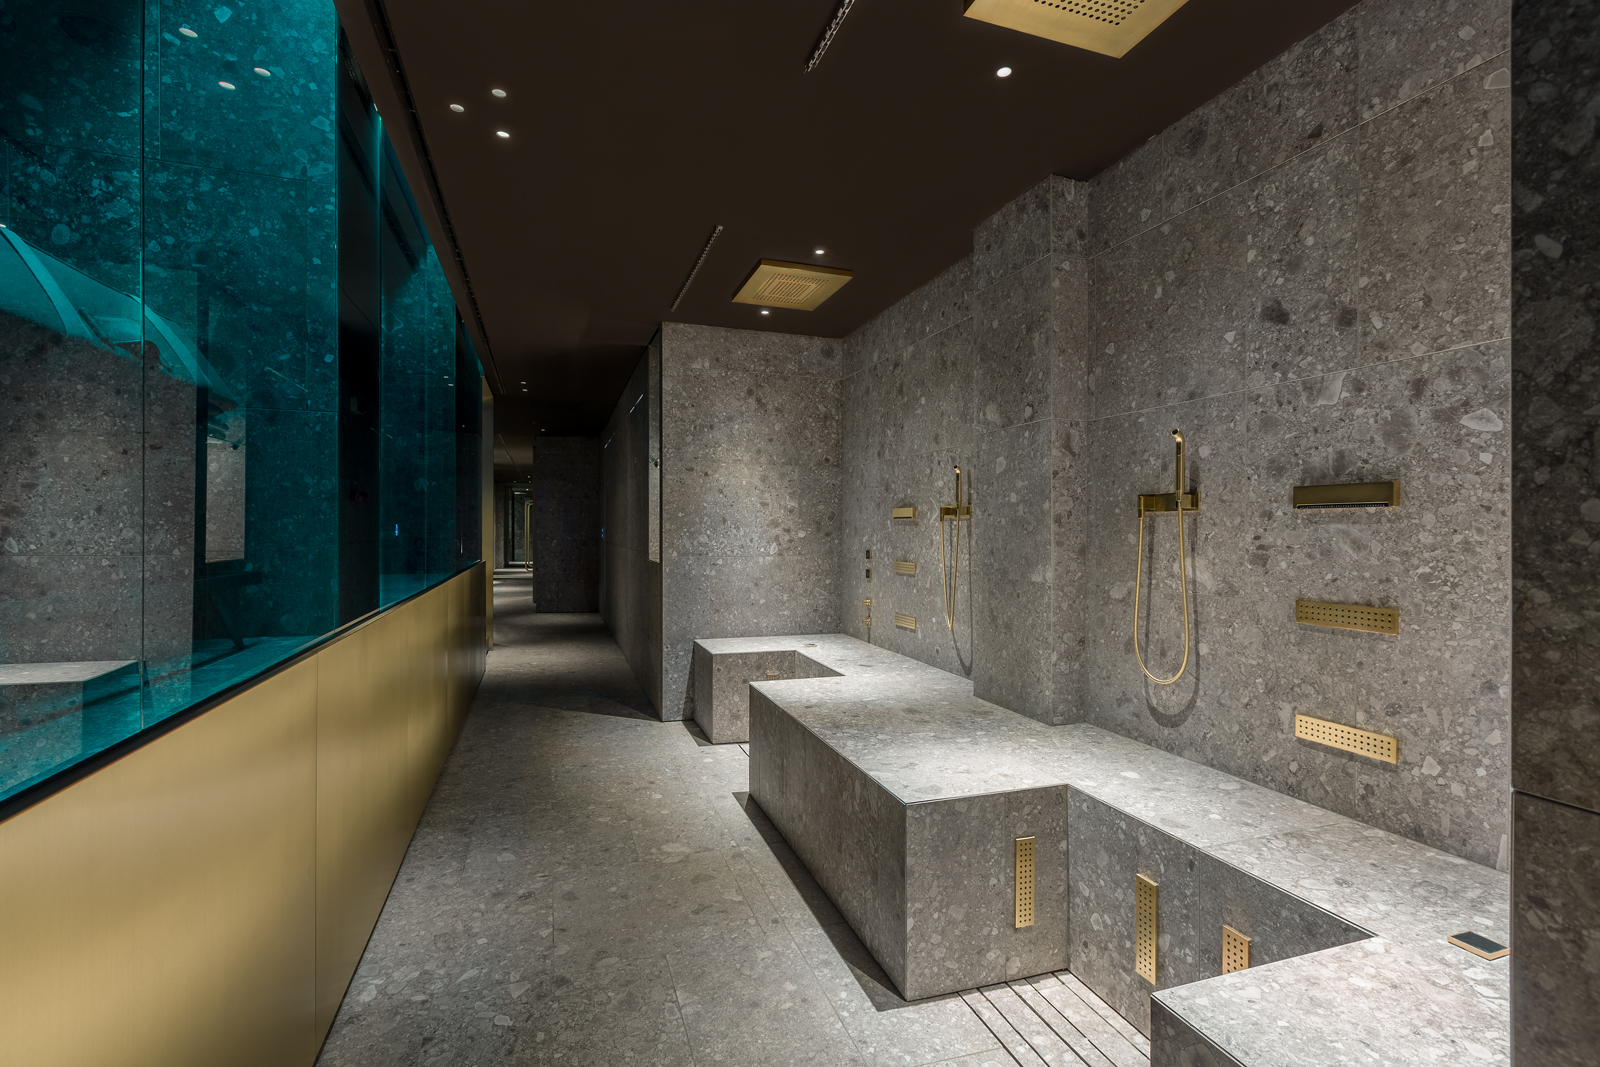 Ceresio 7 gym spa a milano un tempio ultramoderno del for Ceresio 7 gym spa